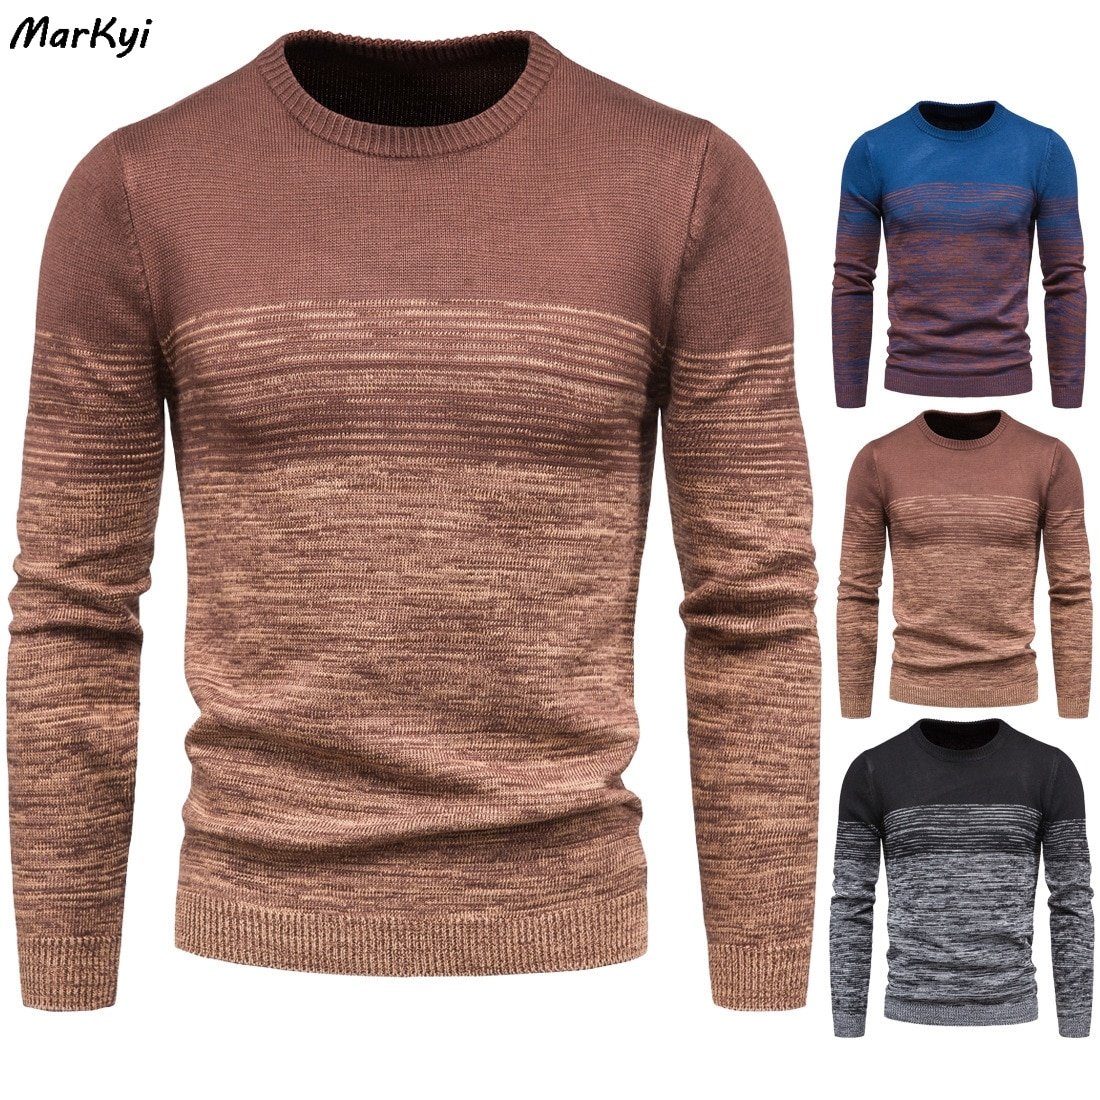 MarKyi 2020 invierno Color Jersey parcheado hombres moda rayas Casual Pull Homme manga larga